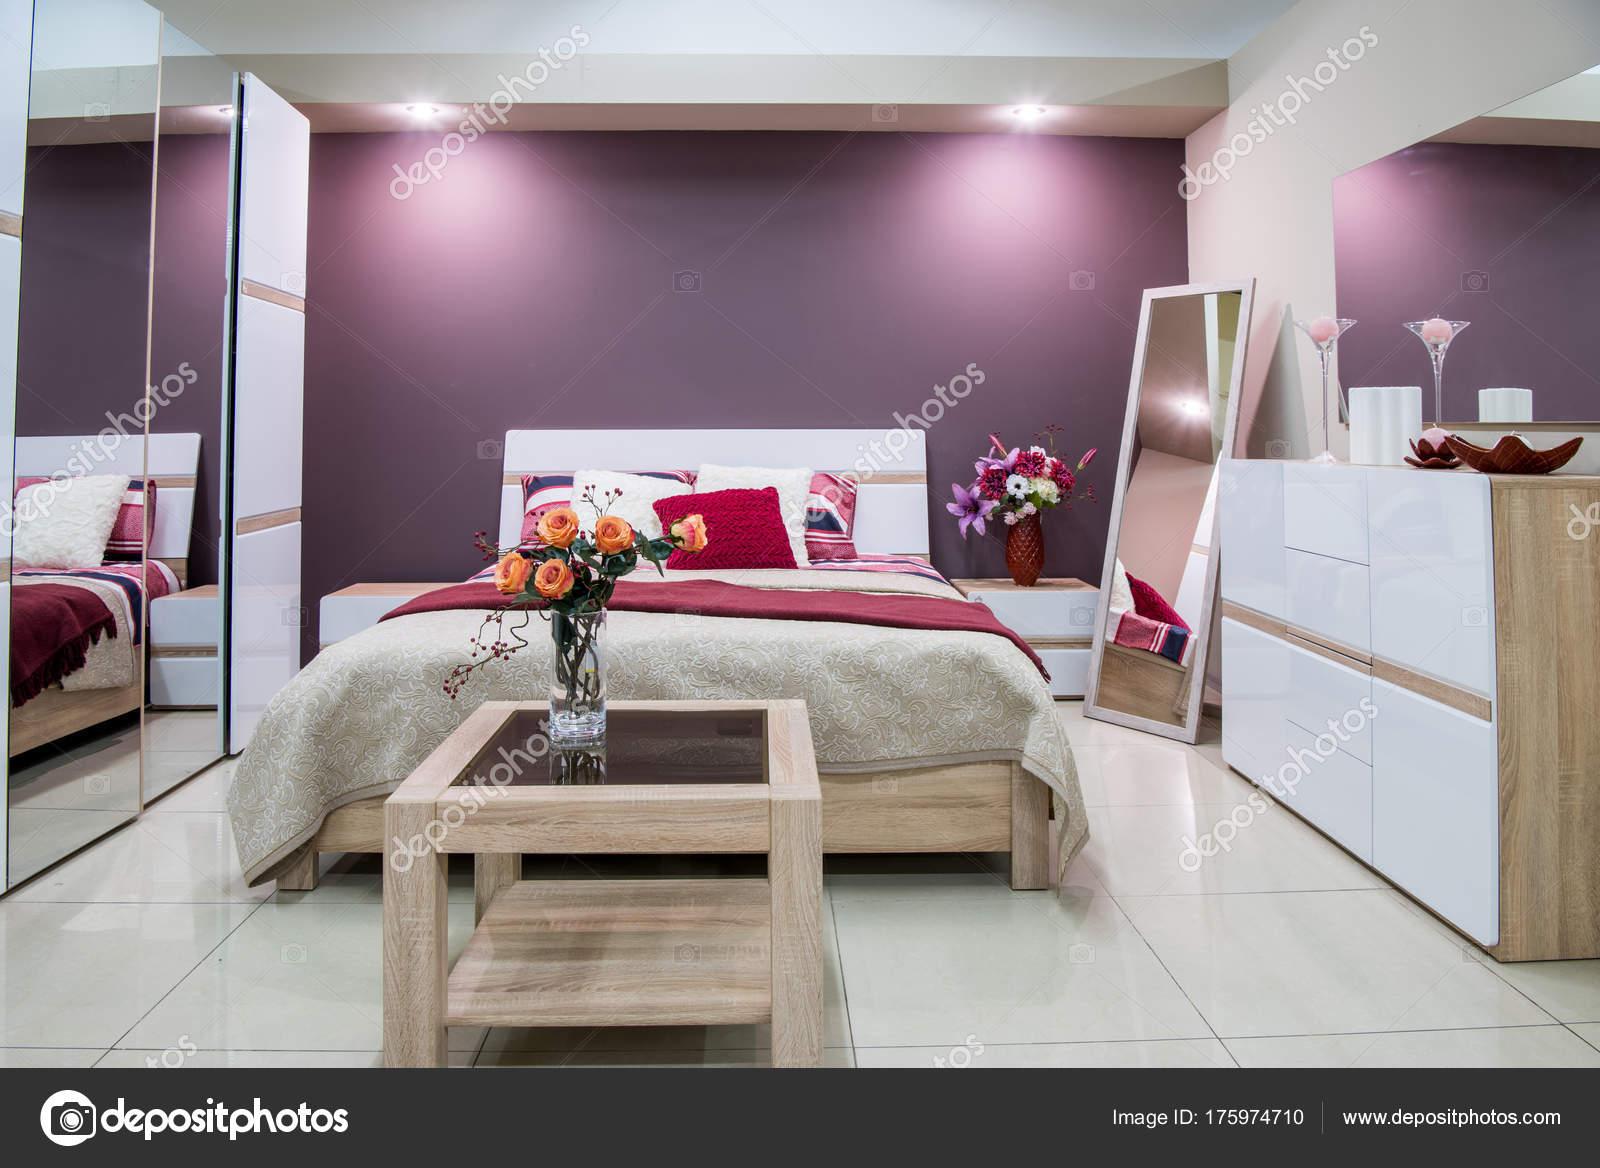 Paarse Accessoires Slaapkamer : Gezellige moderne slaapkamer interieur paarse tinten u stockfoto